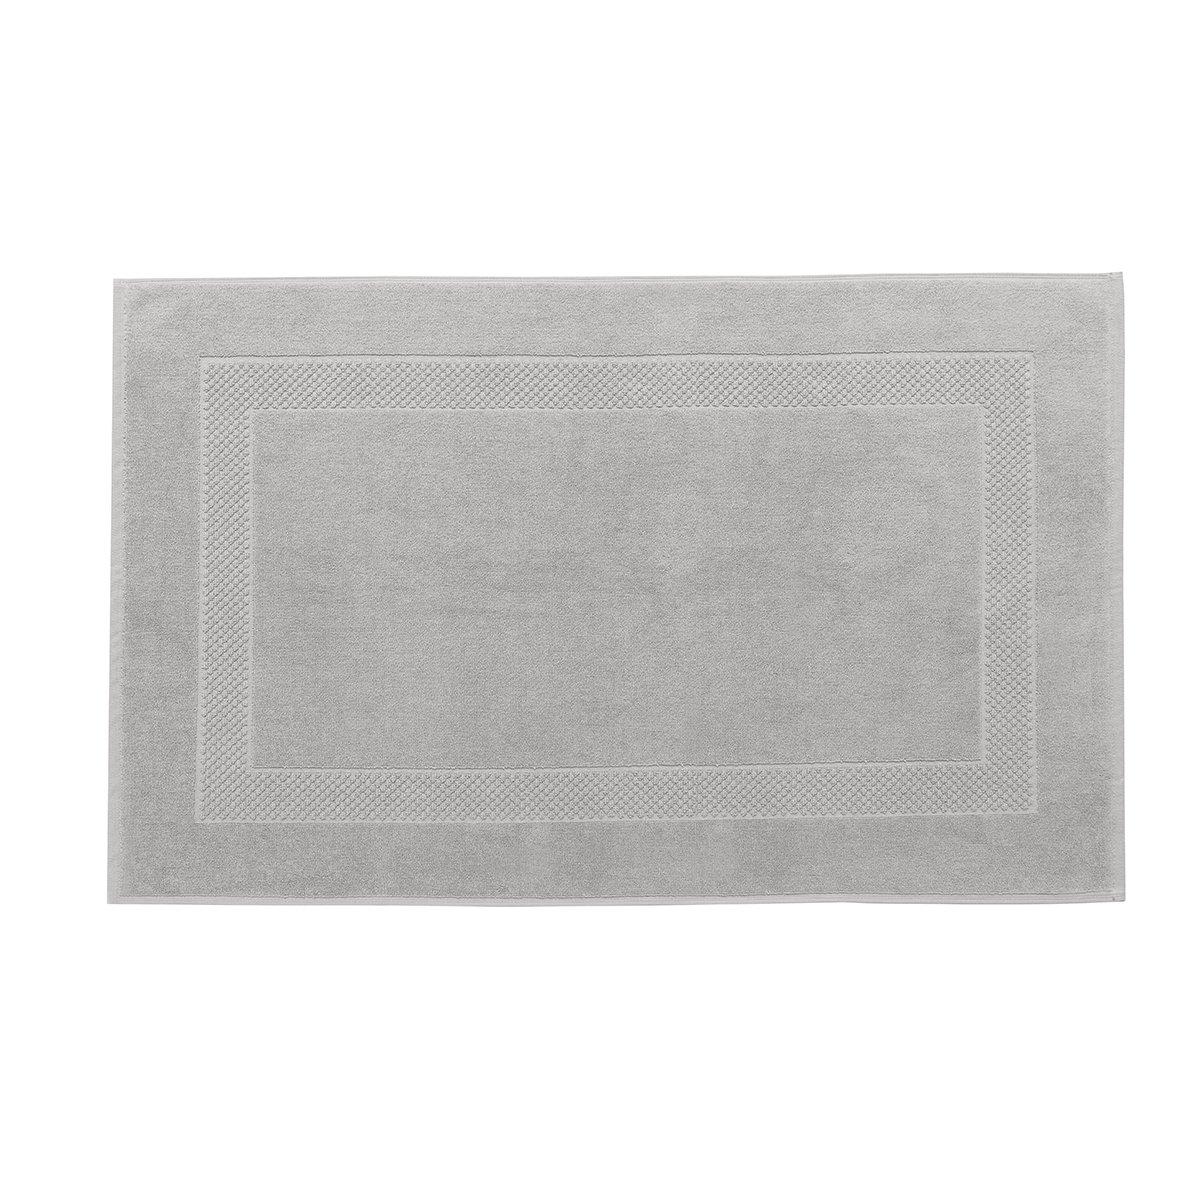 Tapis de bain coton 60x80 cm perle